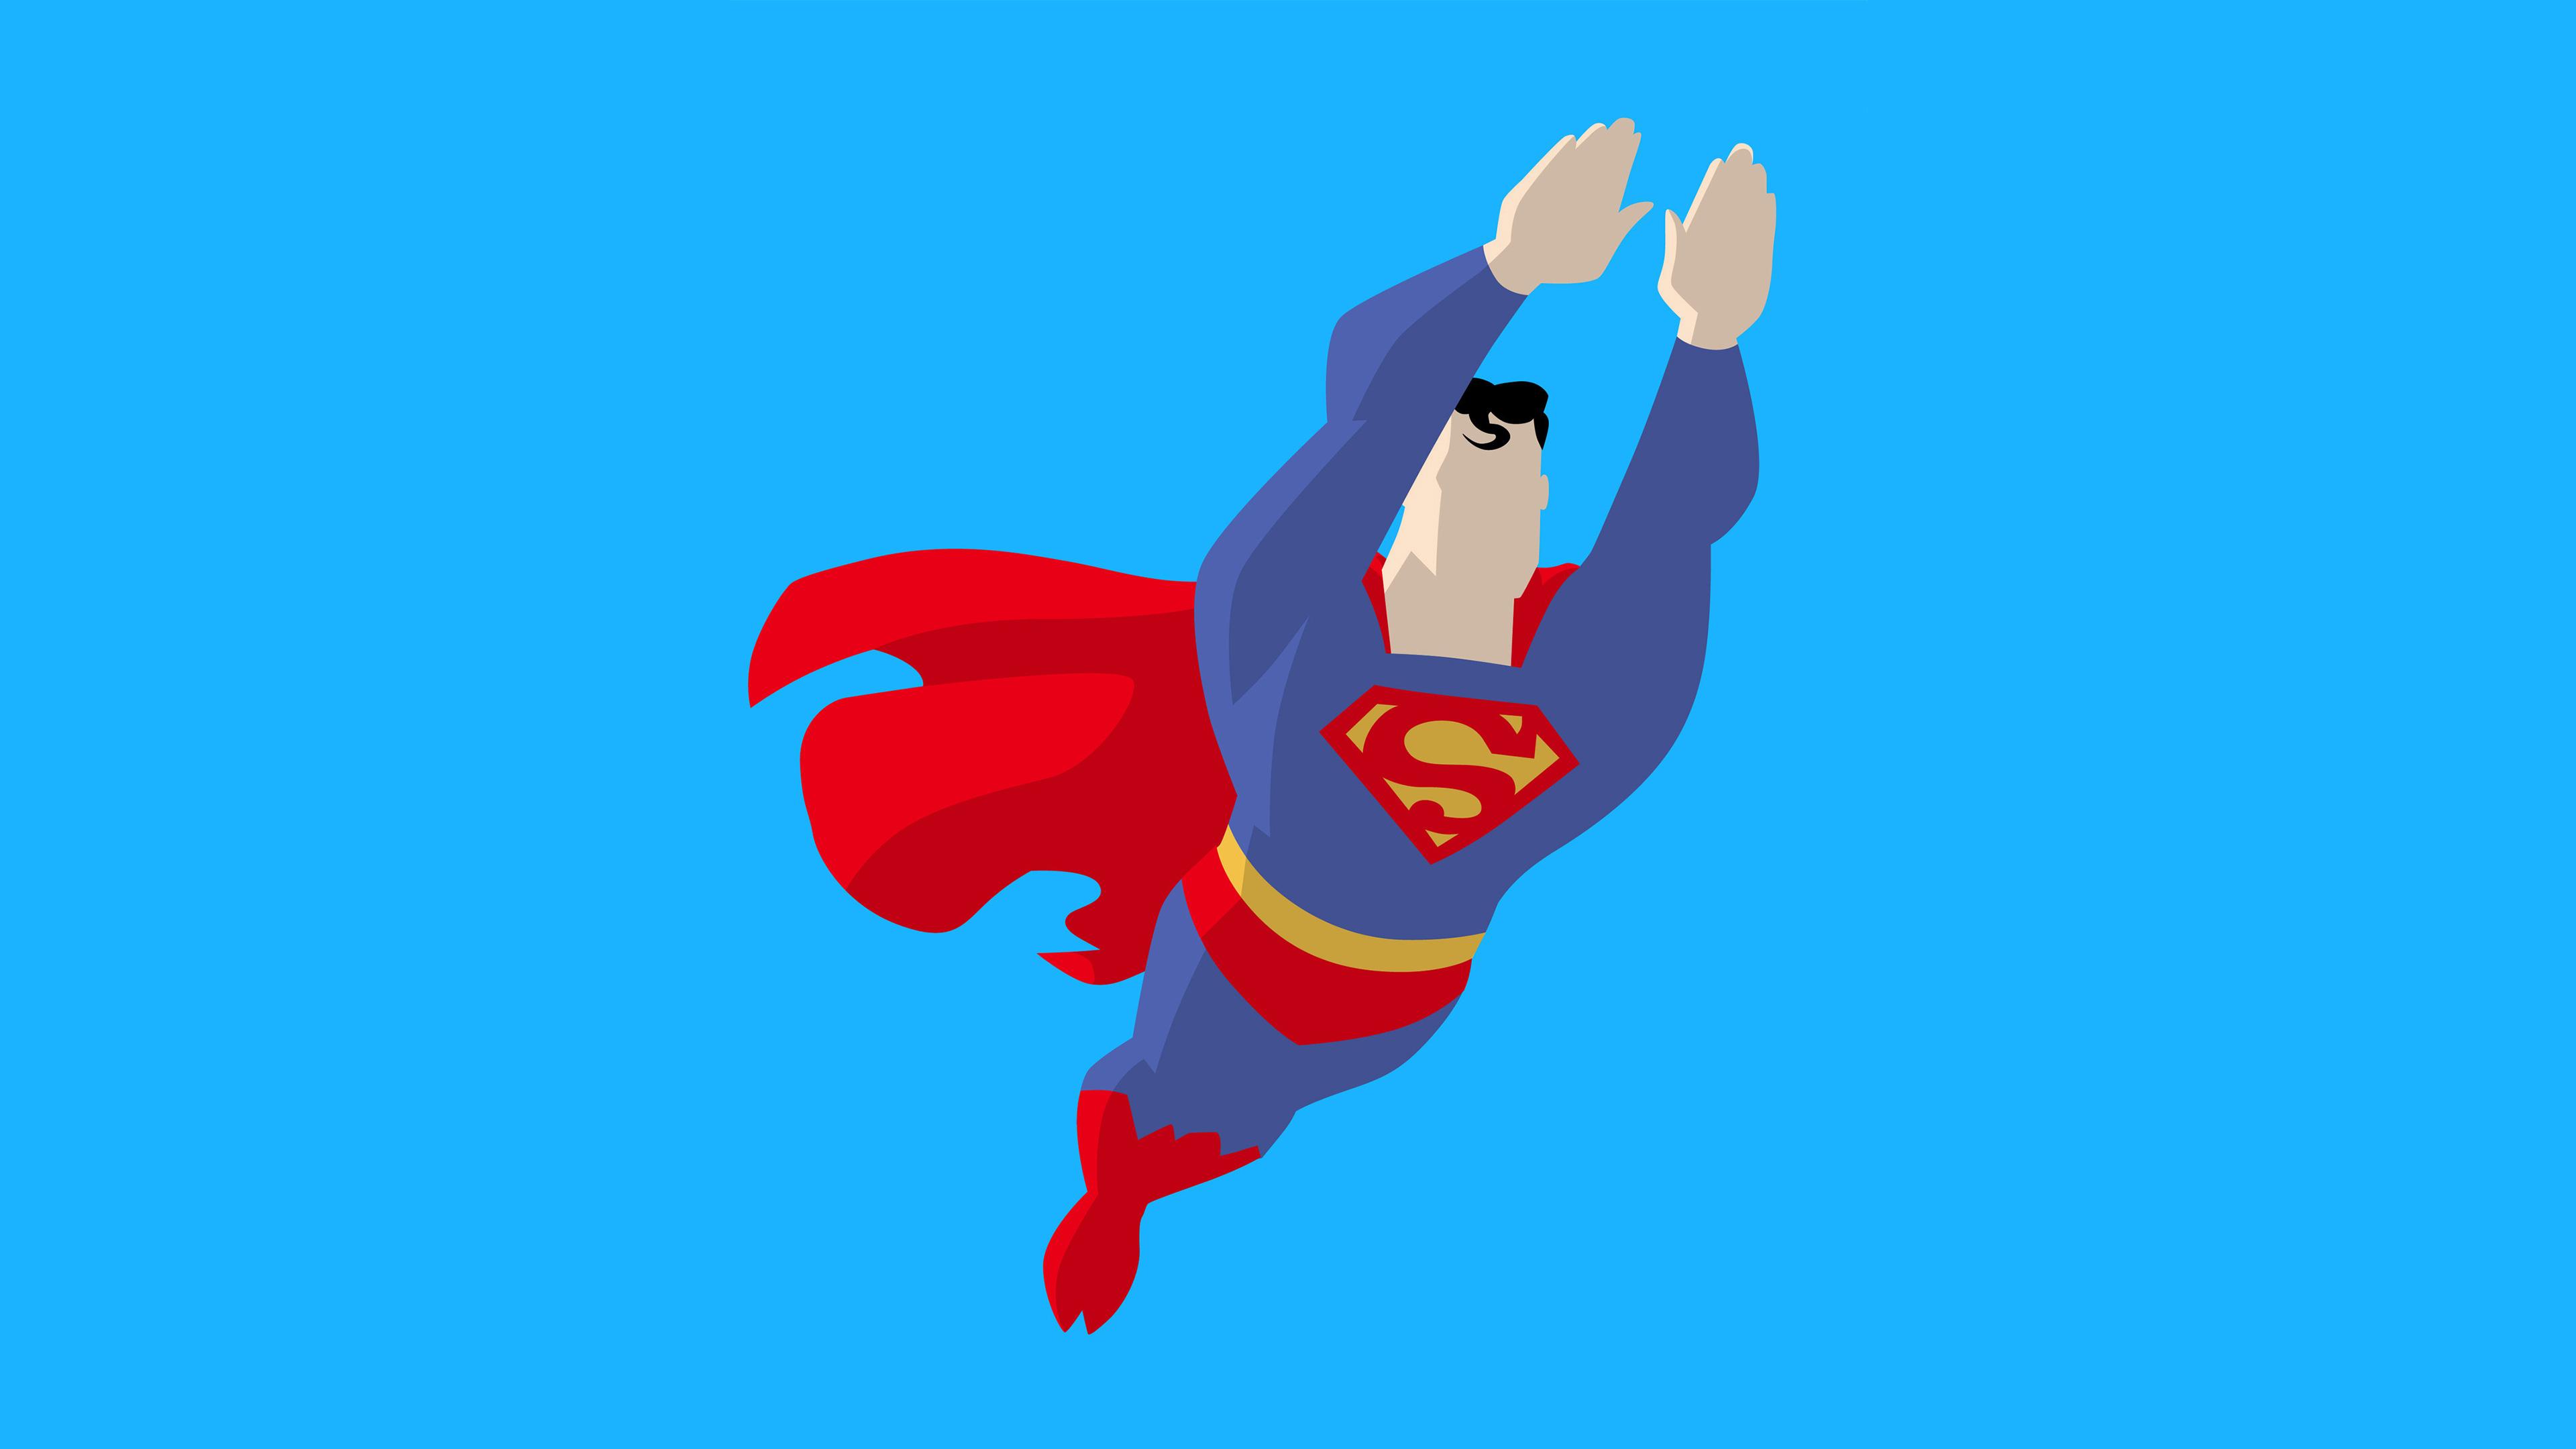 superman vector style 1536521928 - Superman Vector Style - superman wallpapers, superheroes wallpapers, hd-wallpapers, digital art wallpapers, artwork wallpapers, artstation wallpapers, artist wallpapers, 4k-wallpapers